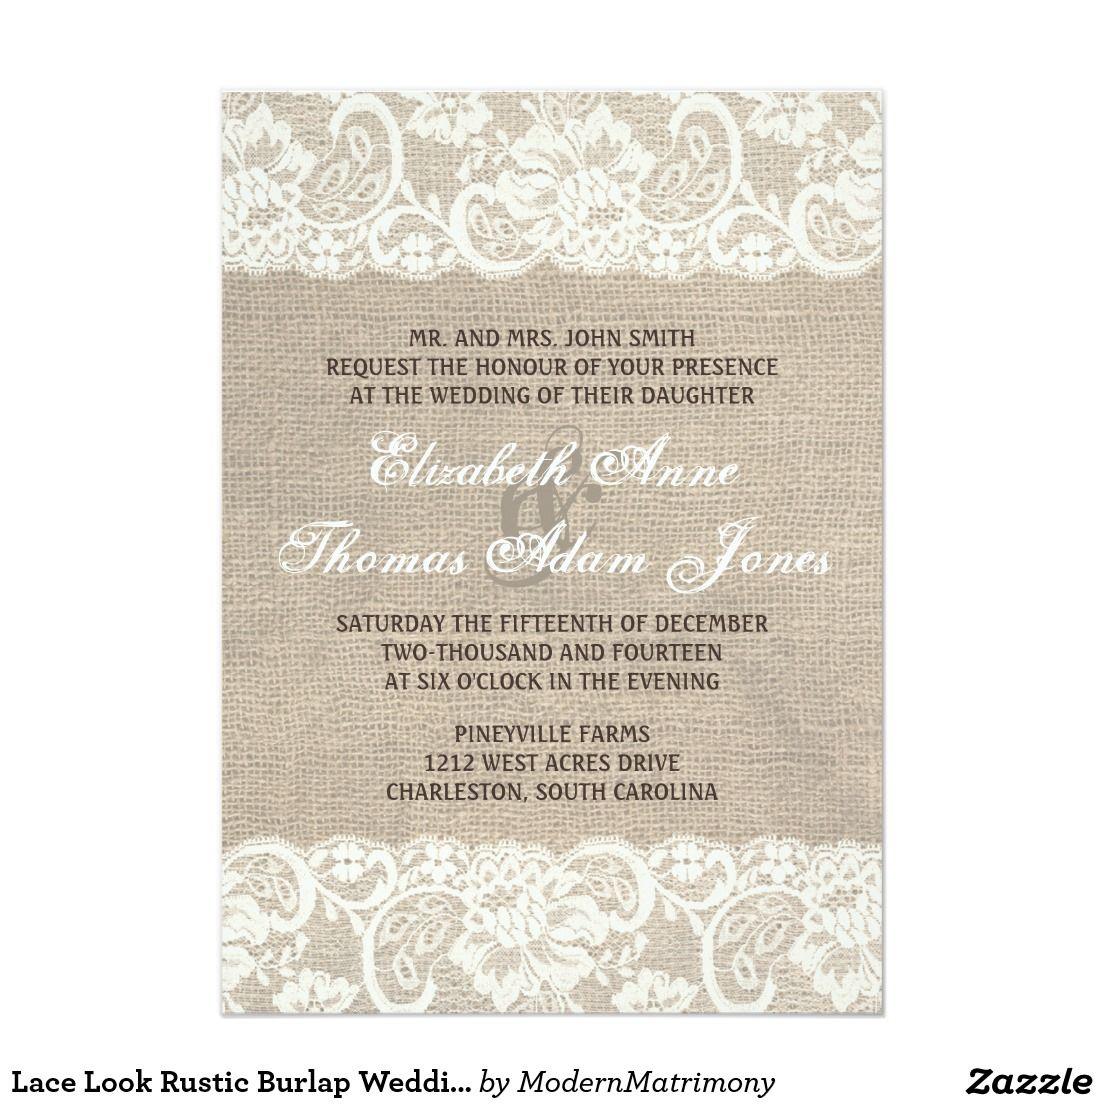 Lace Look Rustic Burlap Wedding Invitation